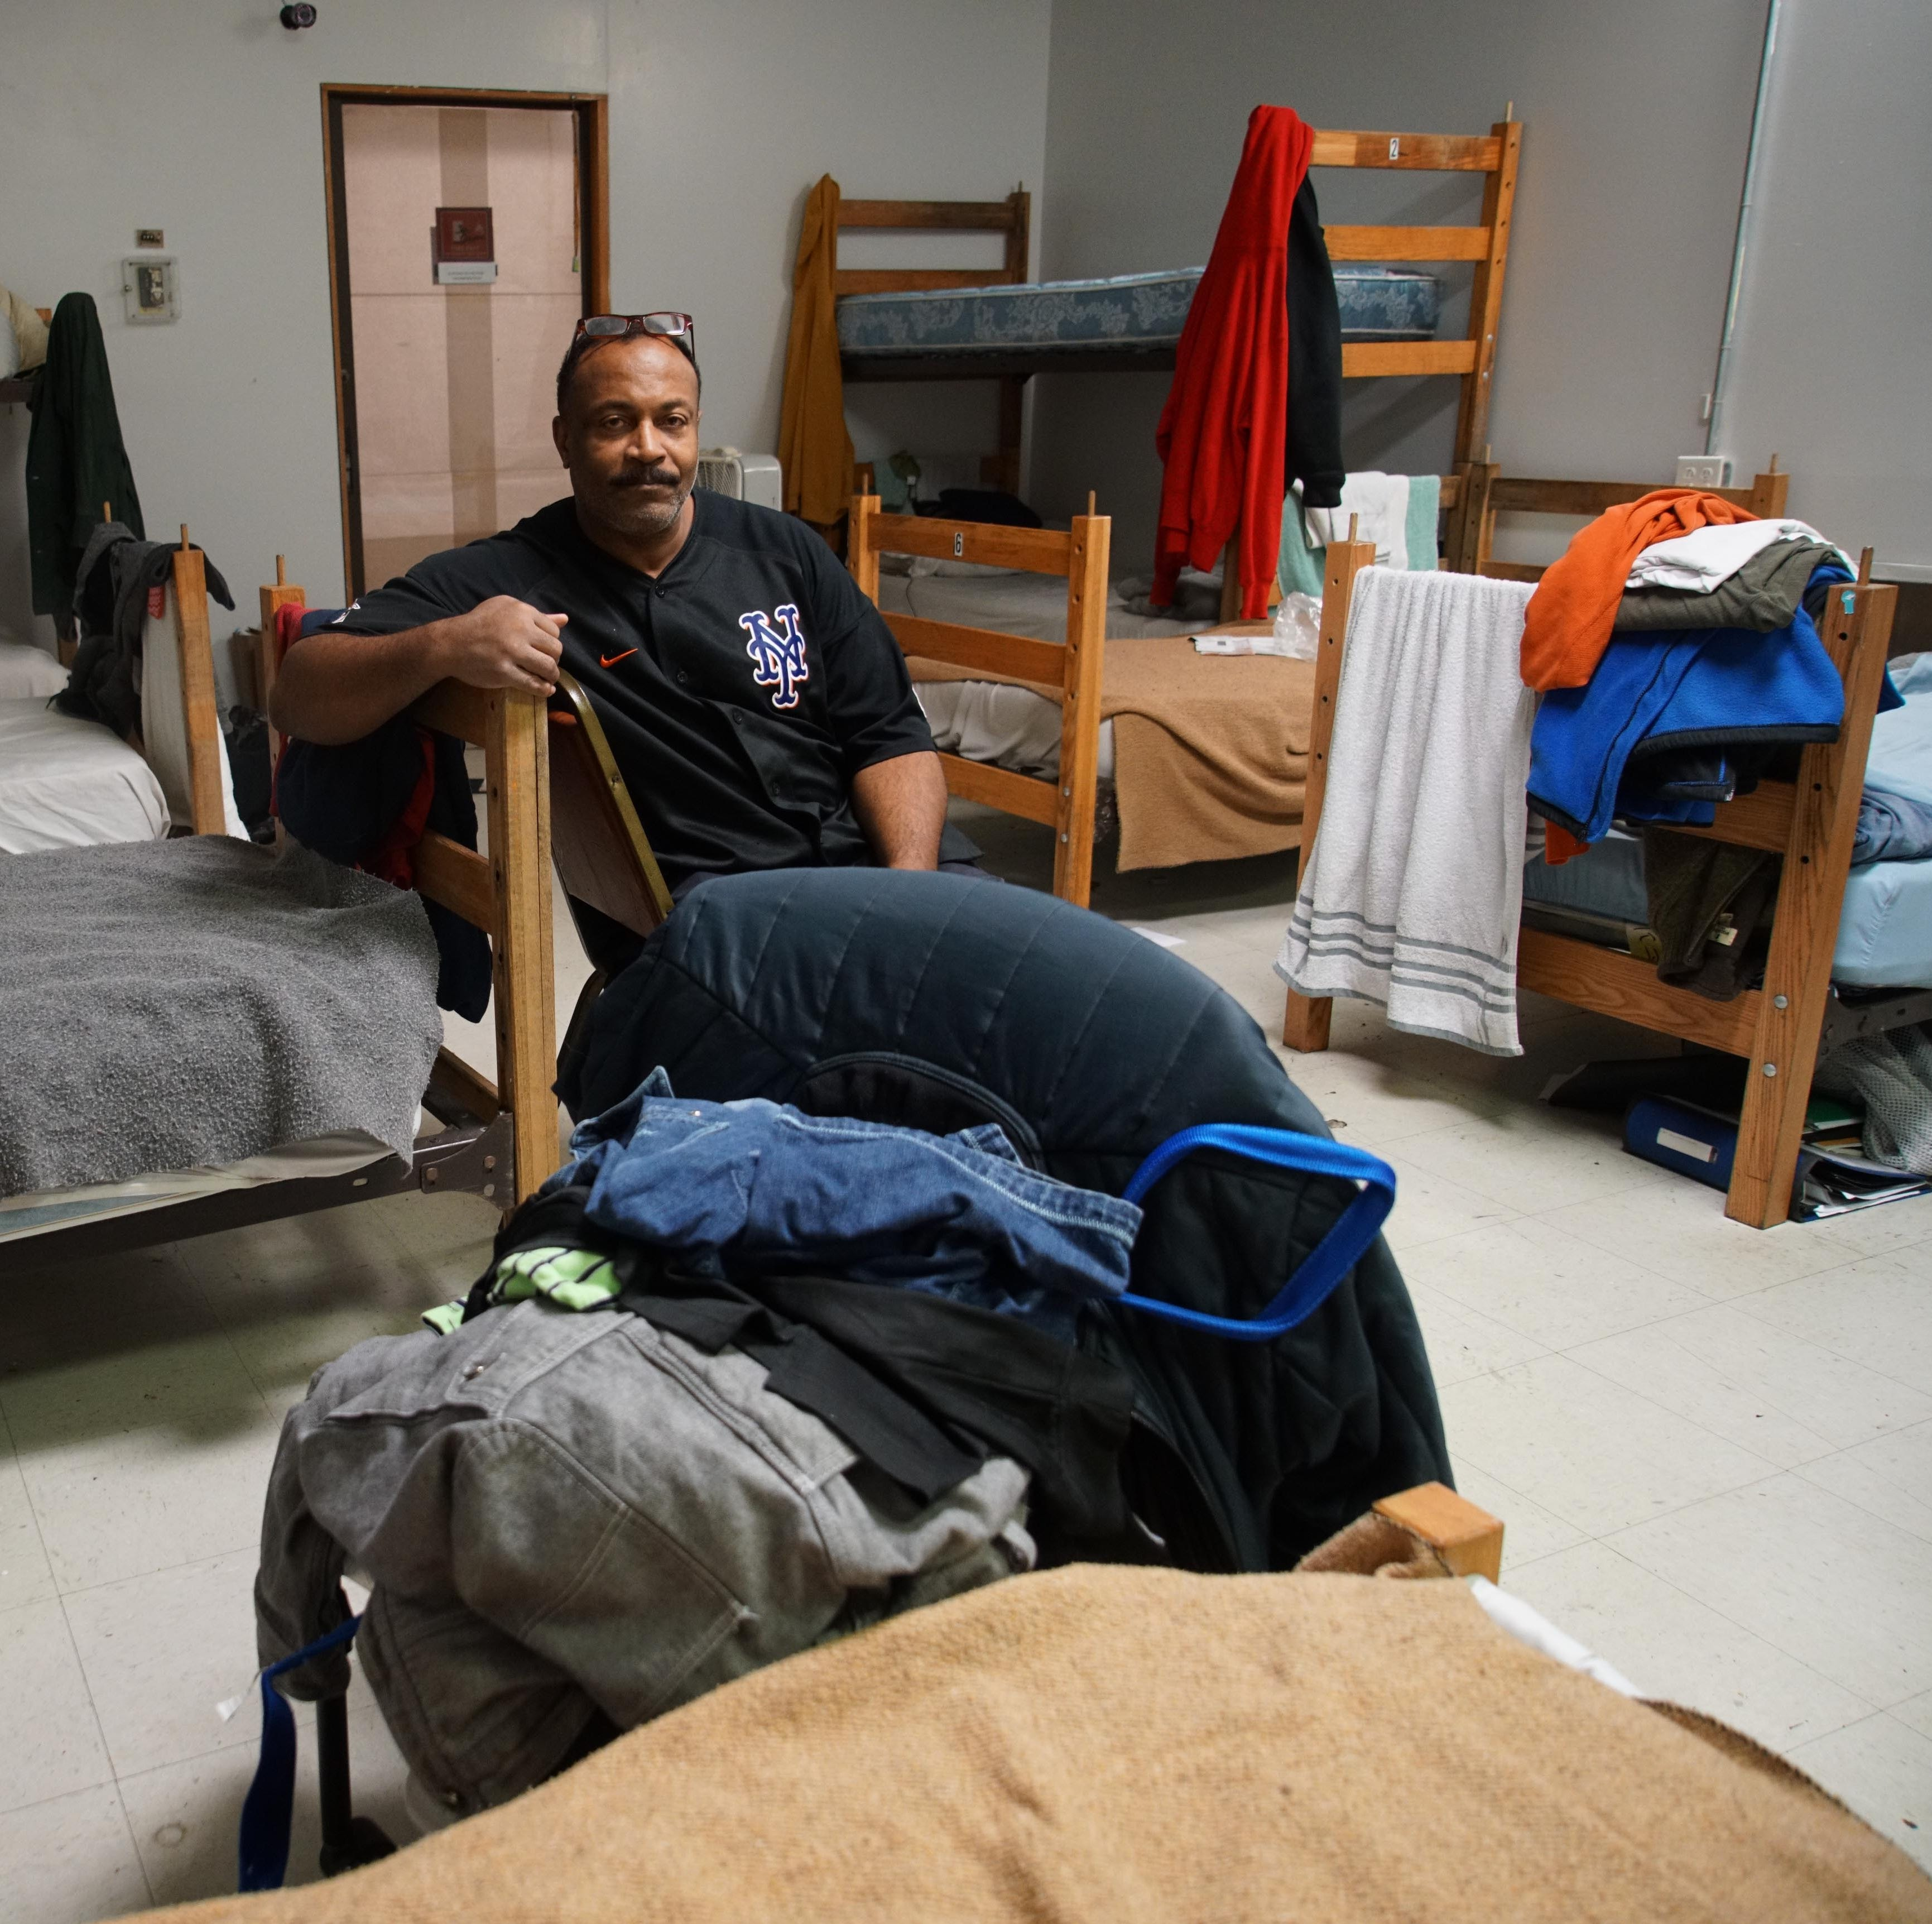 As temperatures drop, Wilmington homeless shelter 'RVRC' plans shutdown